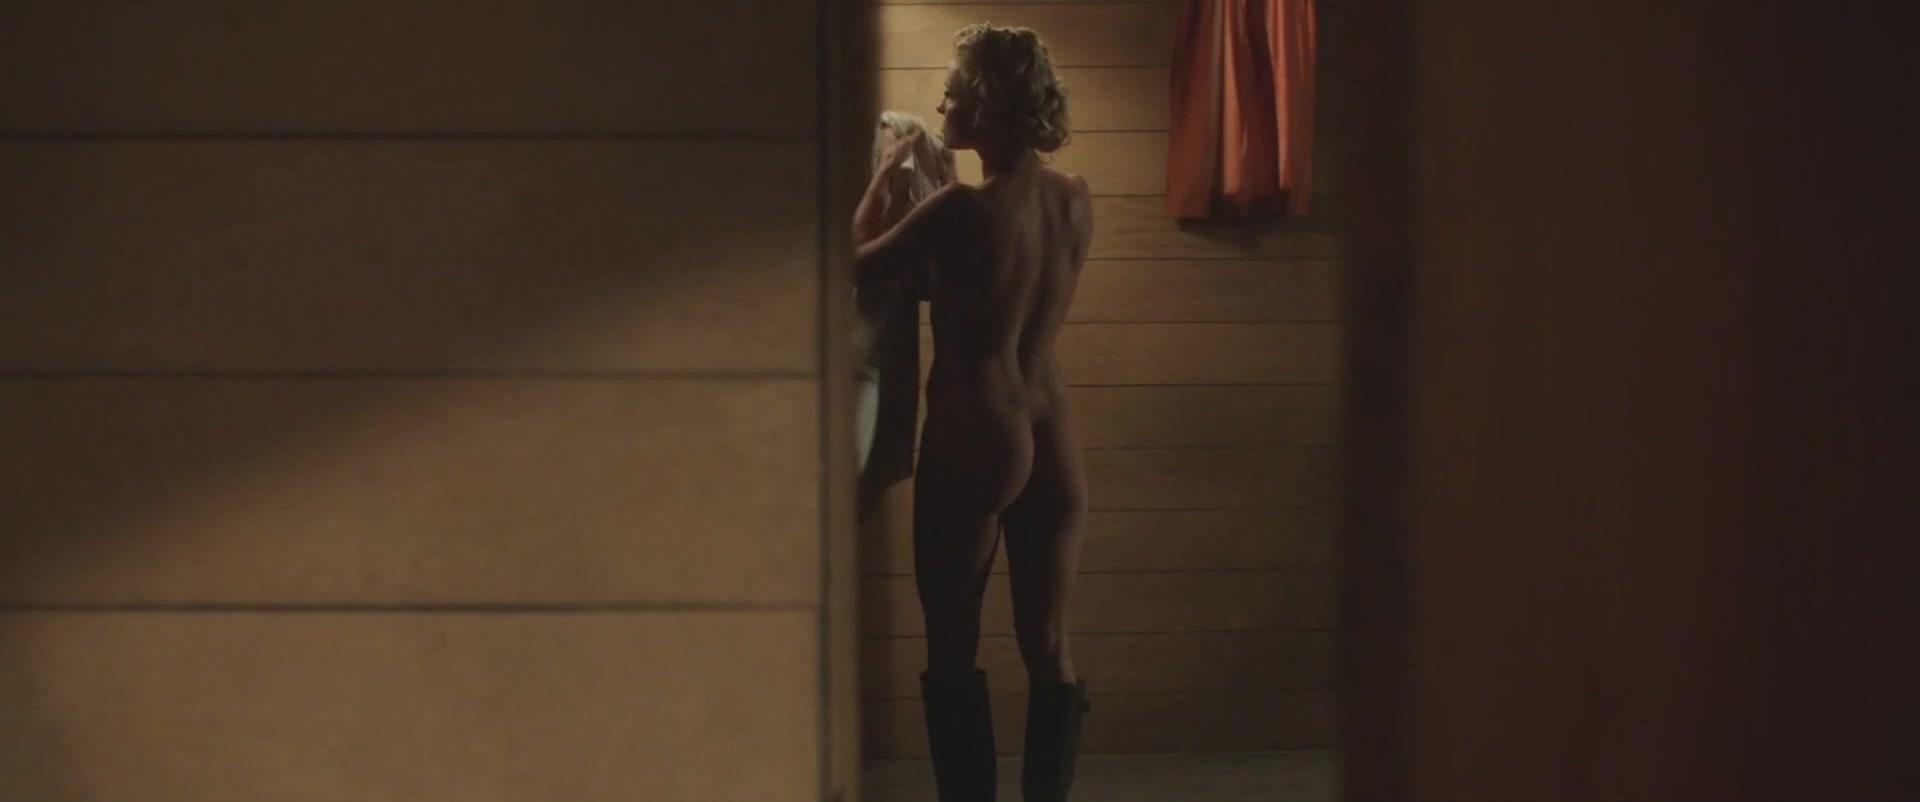 Pamela anderson the people garden nude - 2019 year